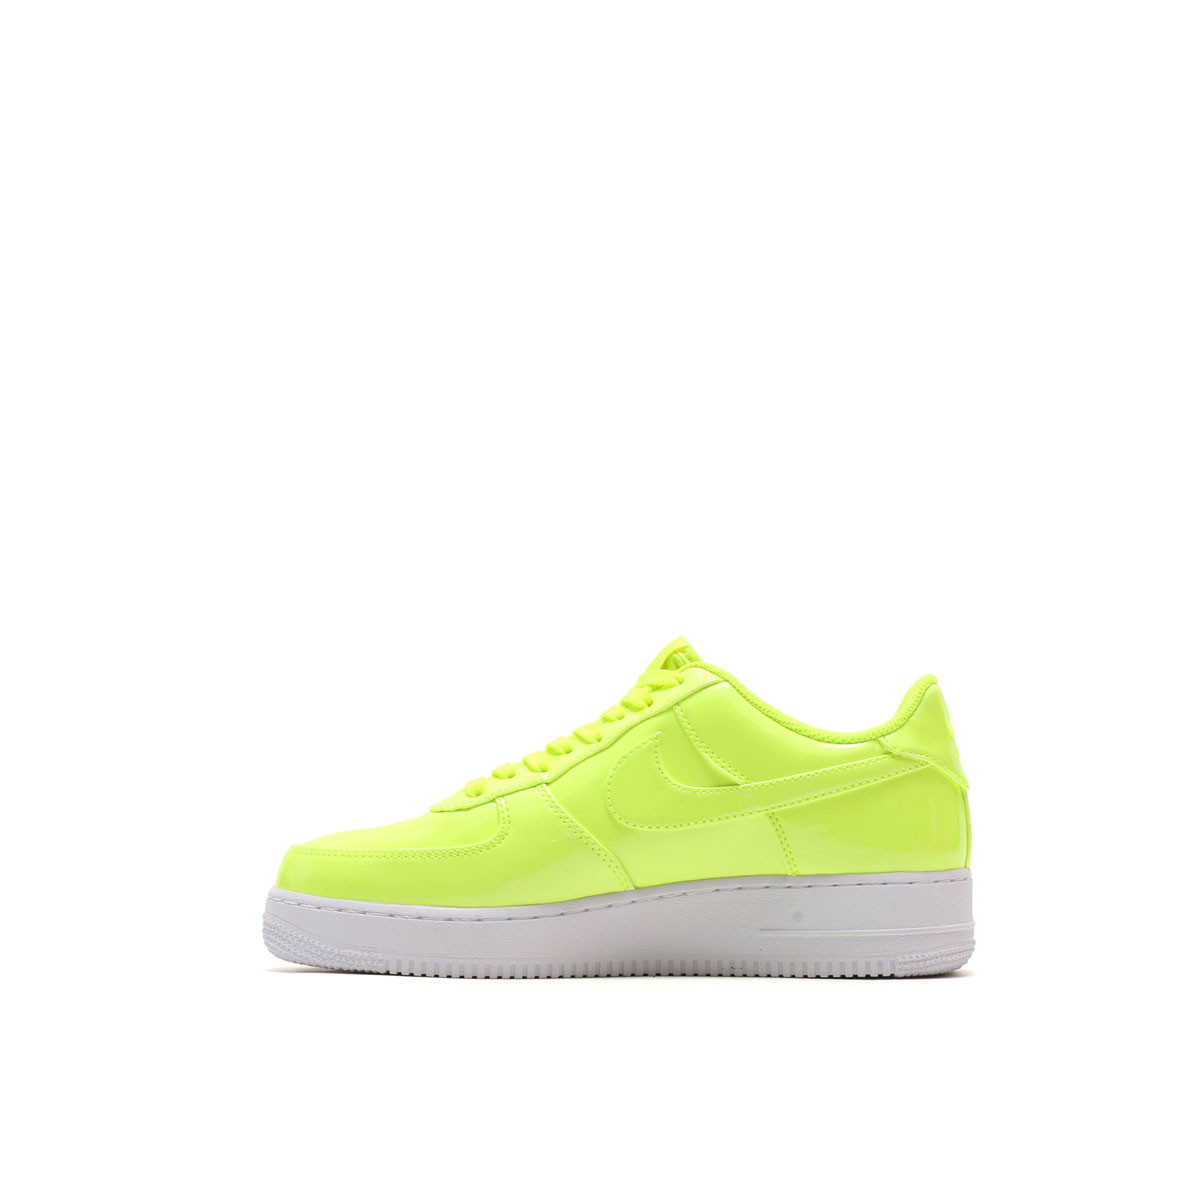 Basket Nike Air Force 1´07 LV8 UV Ref. AJ9505 700